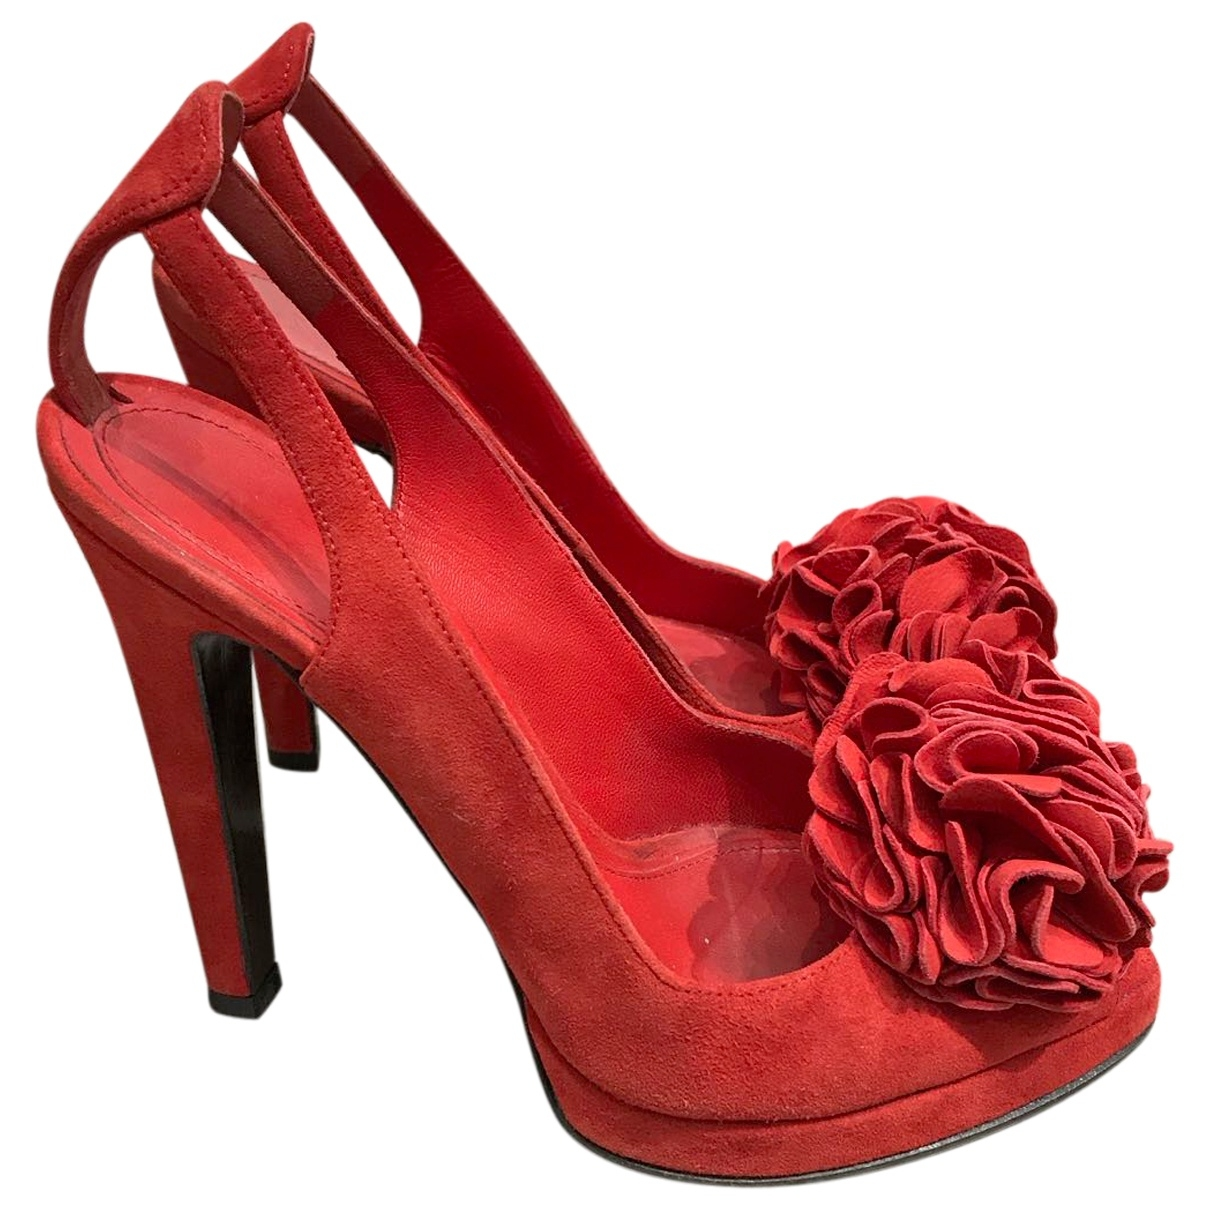 Alexander Mcqueen \N Brown Leather Sandals for Women 35.5 EU